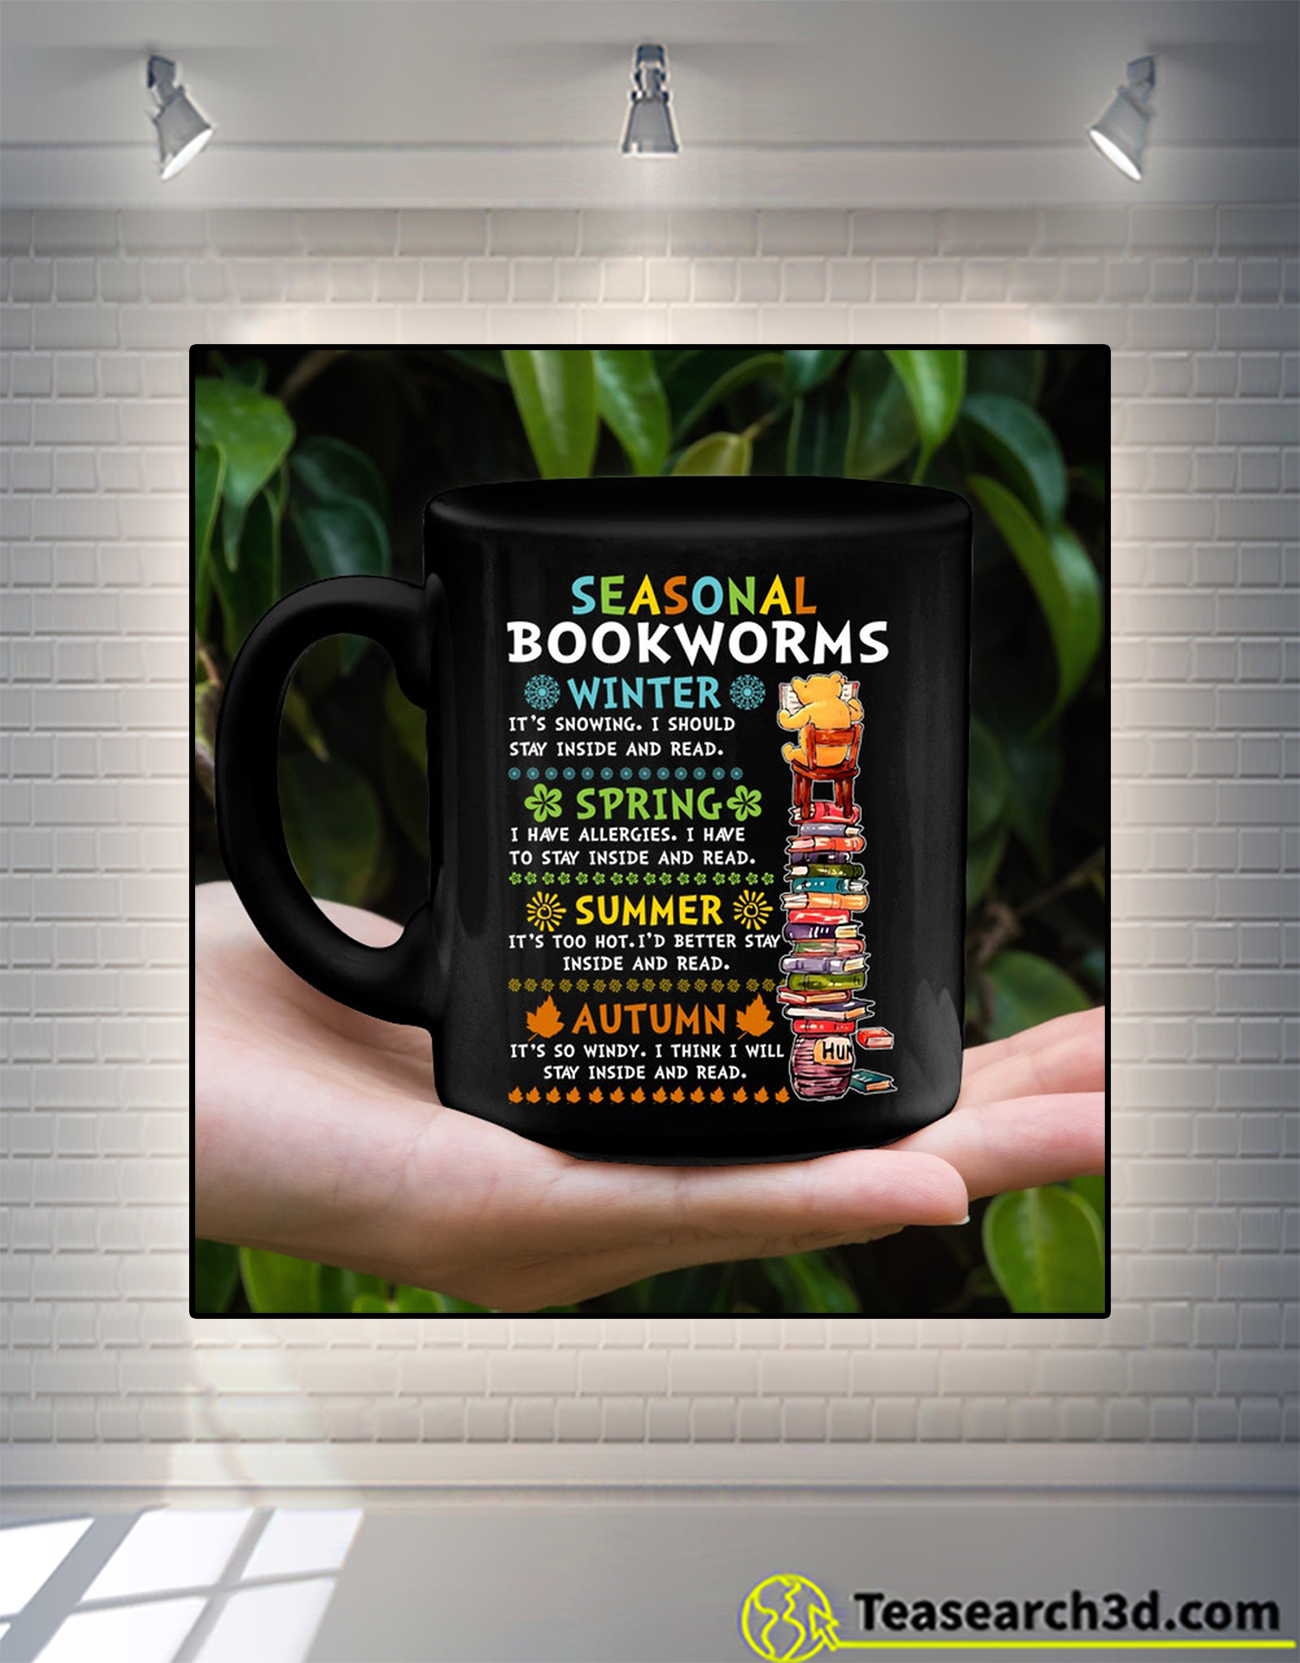 Bear Seasonal bookworms winter mug 1